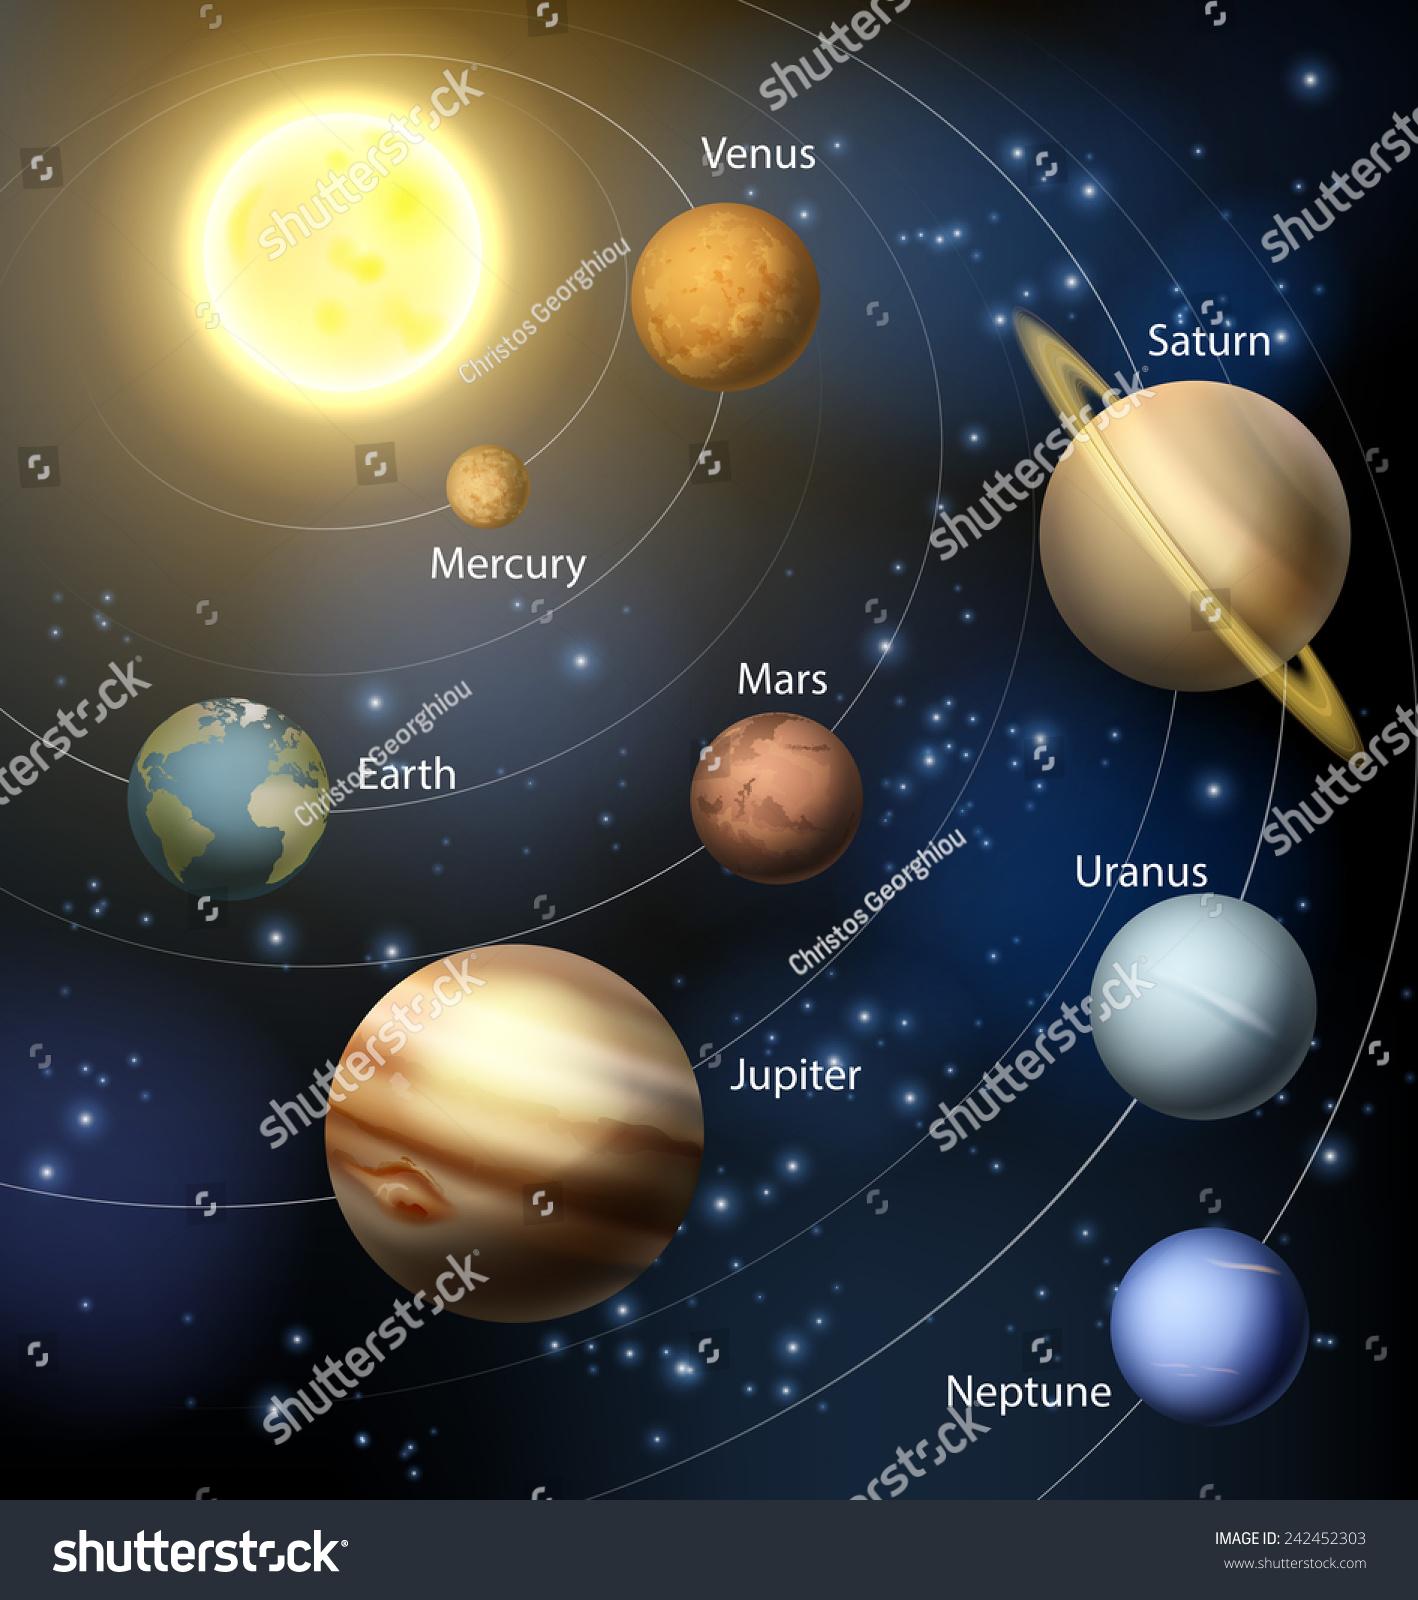 Solar System Planets Orbiting Sun Text Stock Vector ...